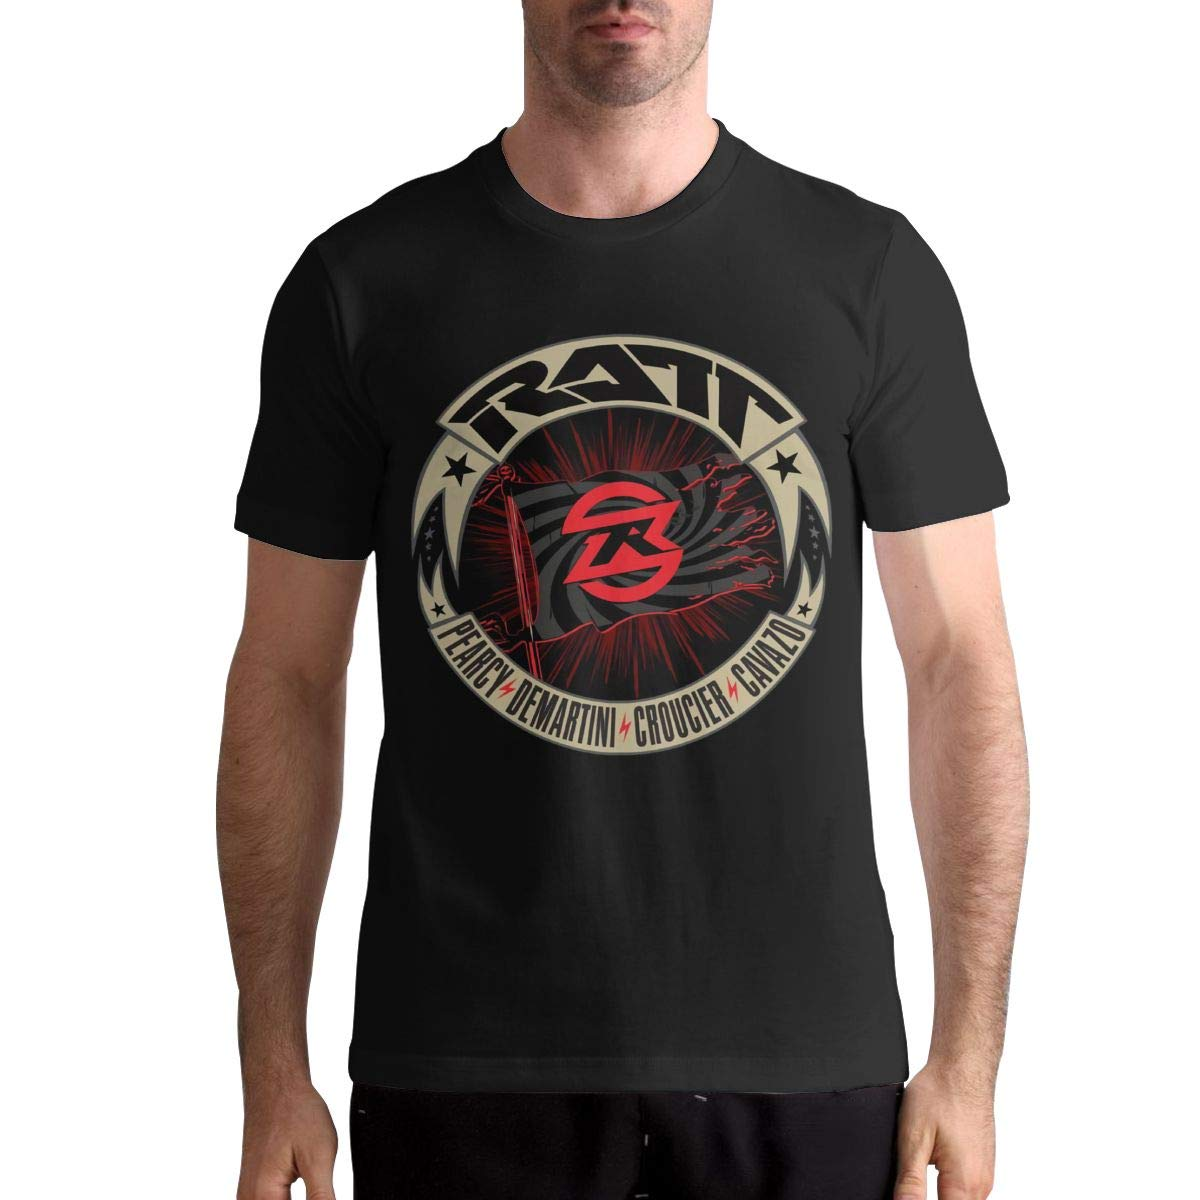 Ratt Band T Shirt T Shirt Fashion Sports Tops Round Neck Short Sleeve Tee 5705